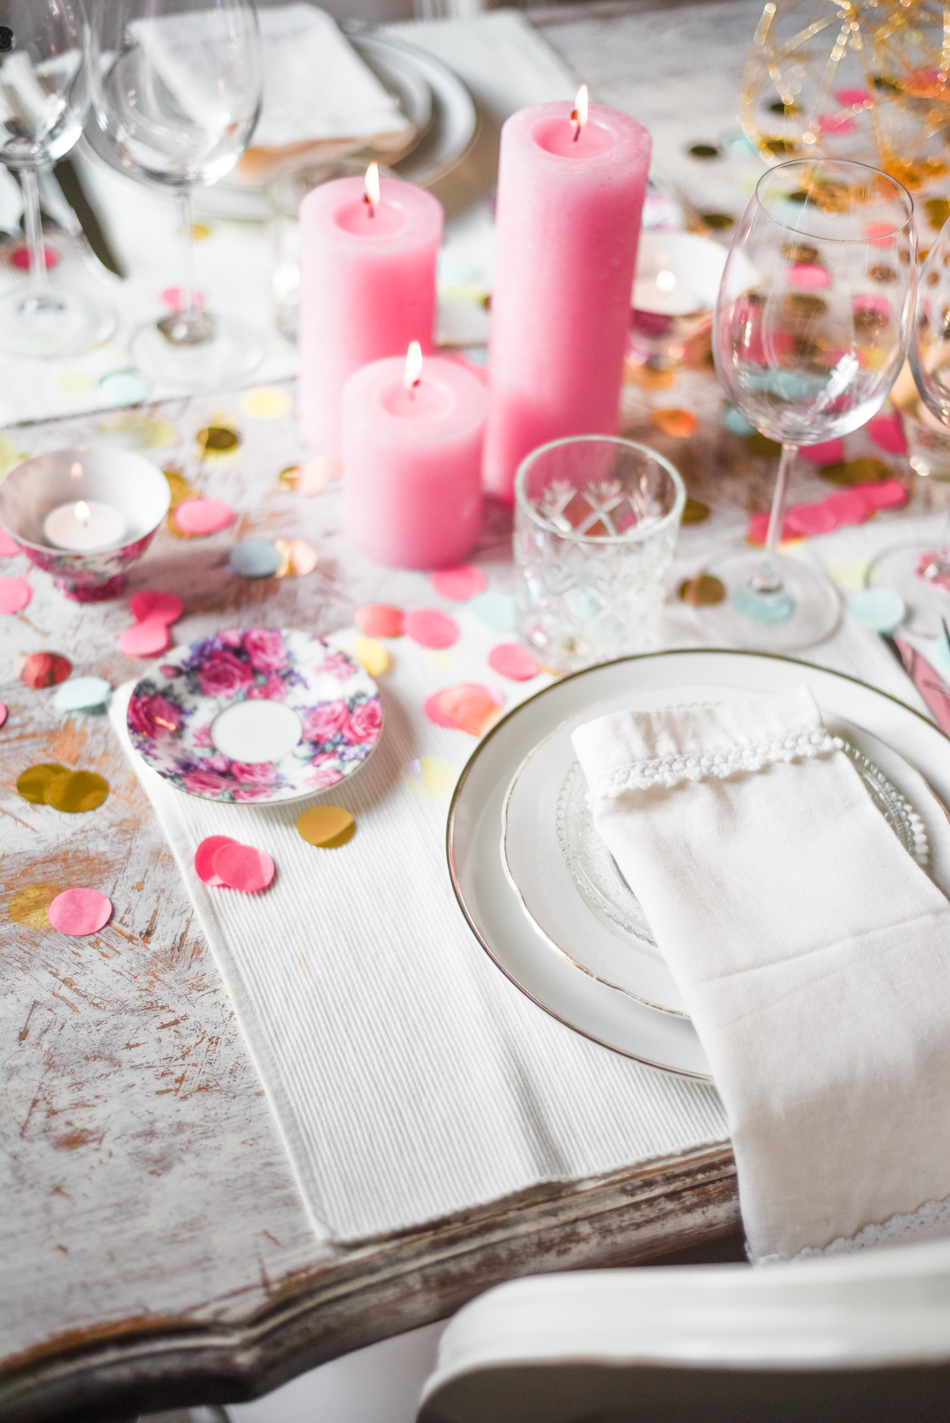 Valentinesday-table-setting-decor-styling-AnaisStoelen-12.jpg